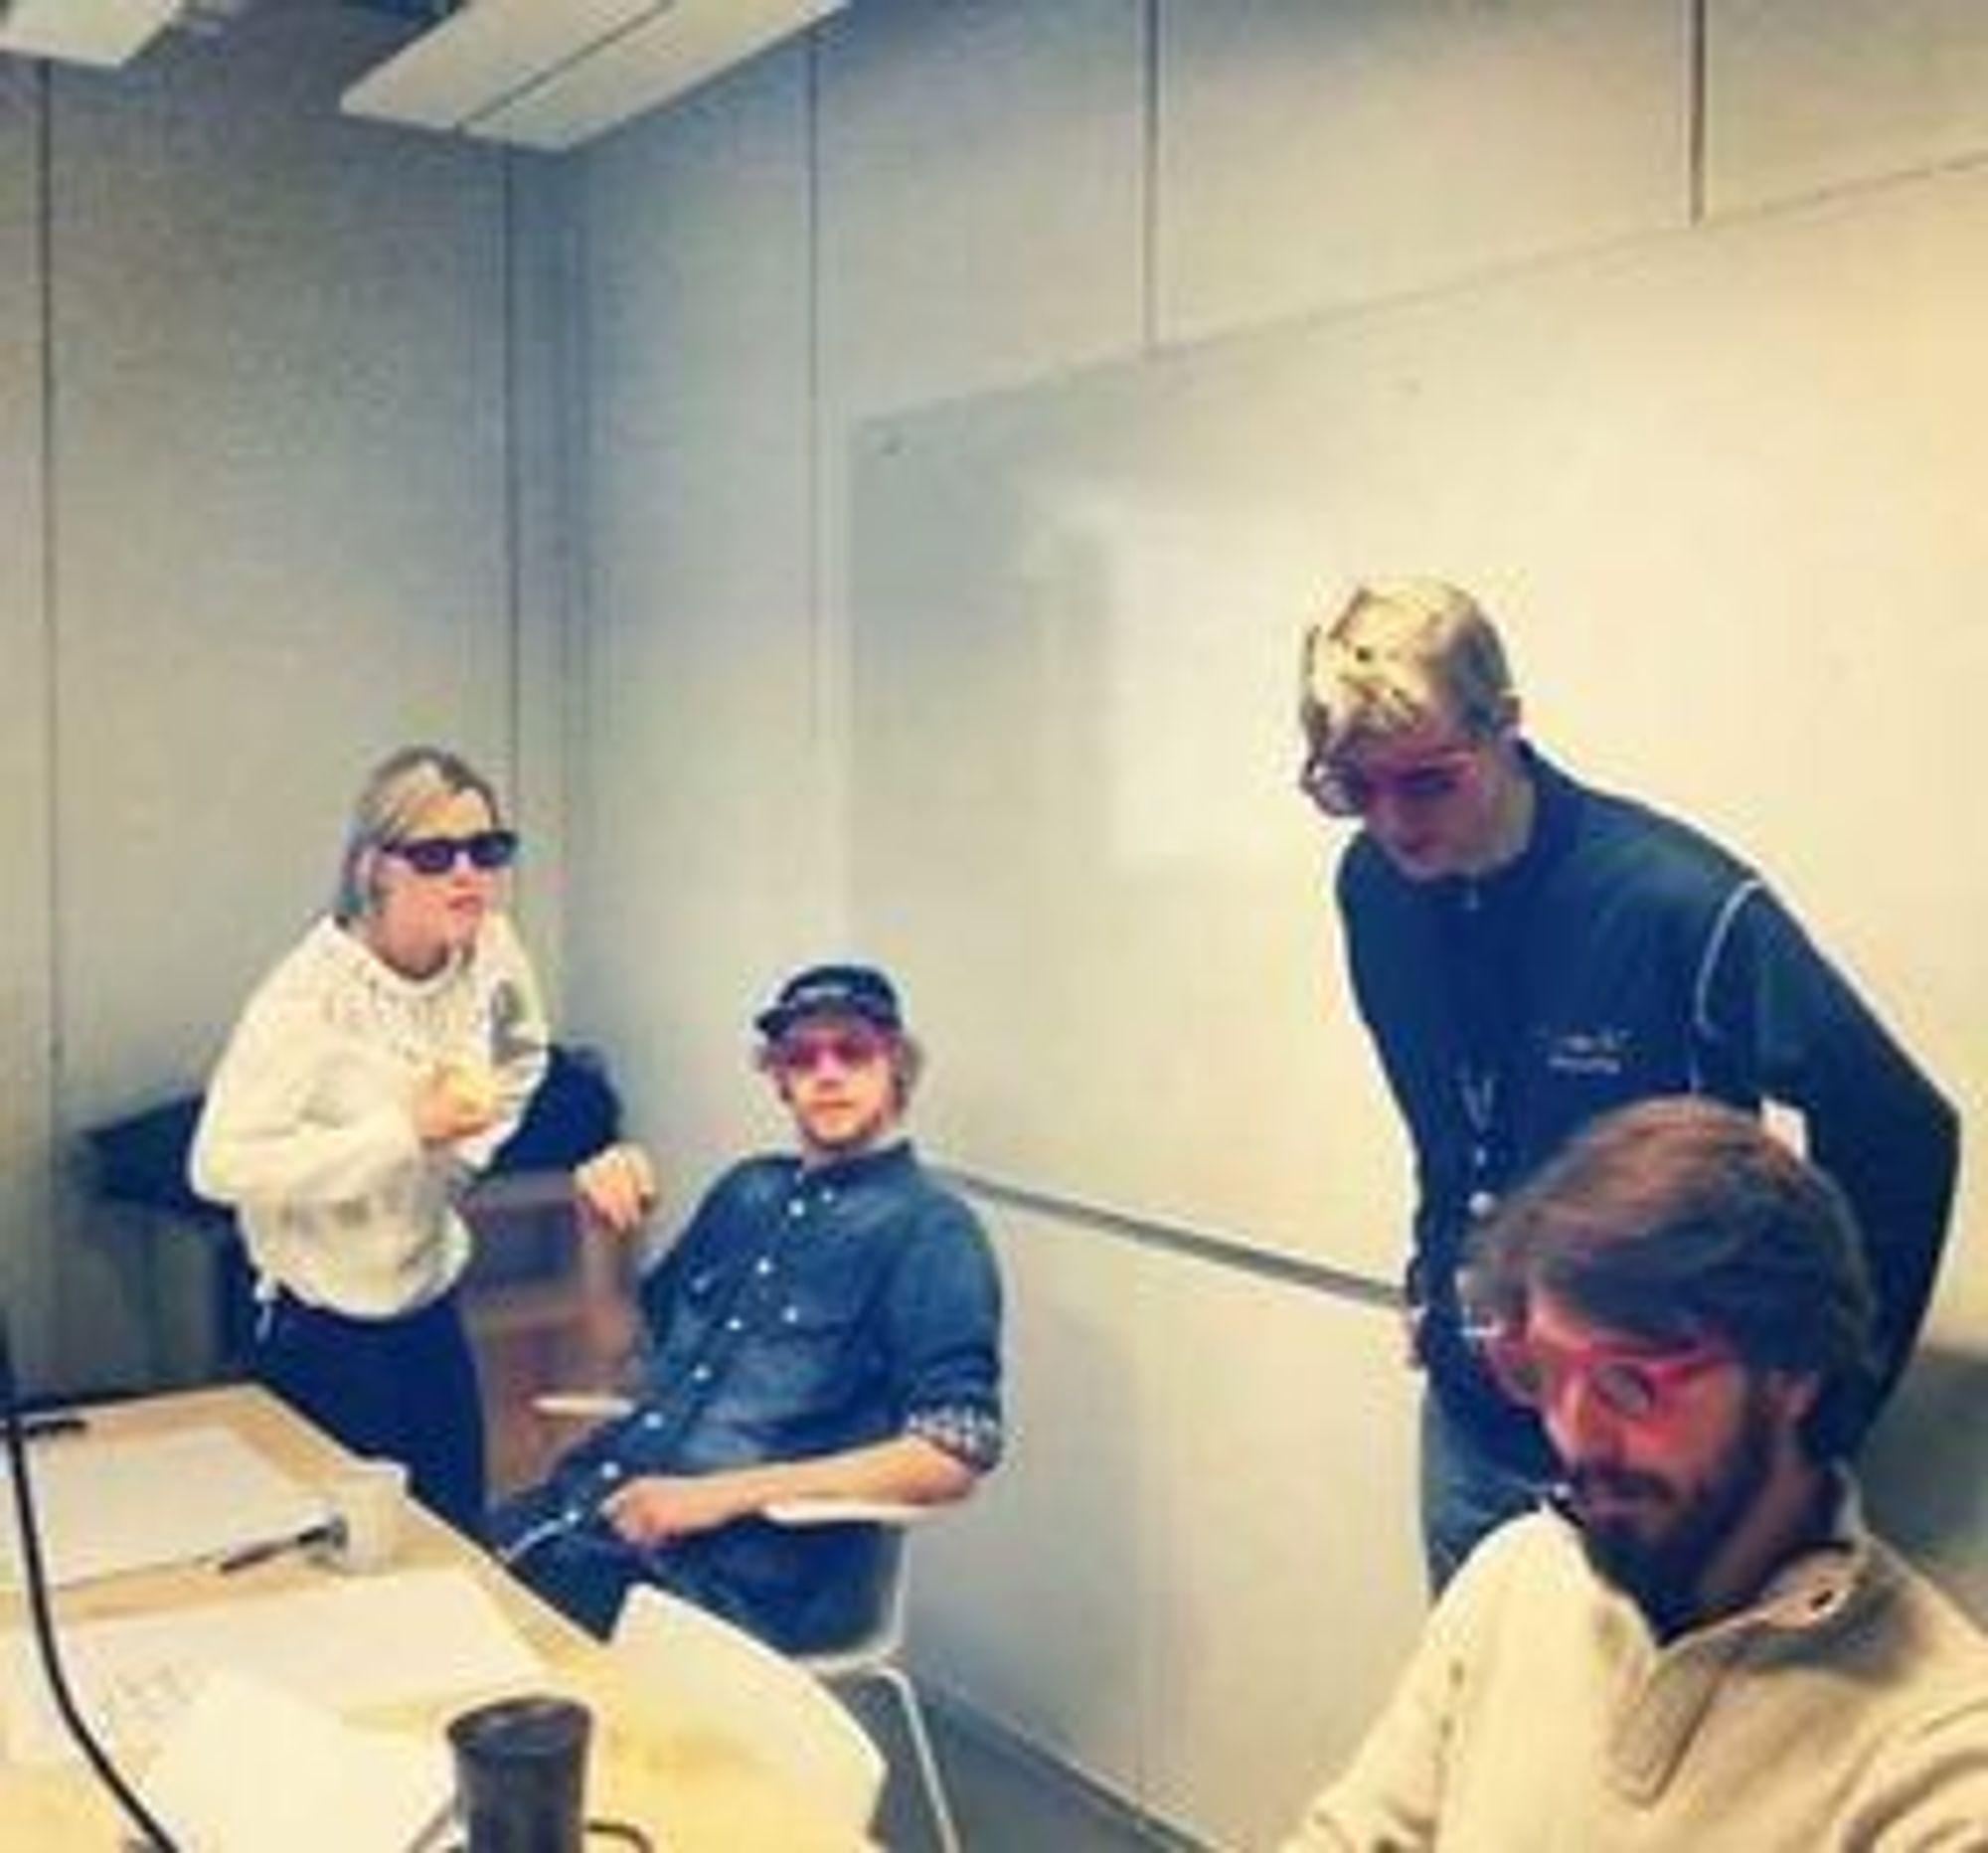 Vilde Fjeldstad (til venstre), Asbjørn Voie, og teamleder Geir Engdal og Sigmund Hansen sjekker løsningen med 3D-briller.